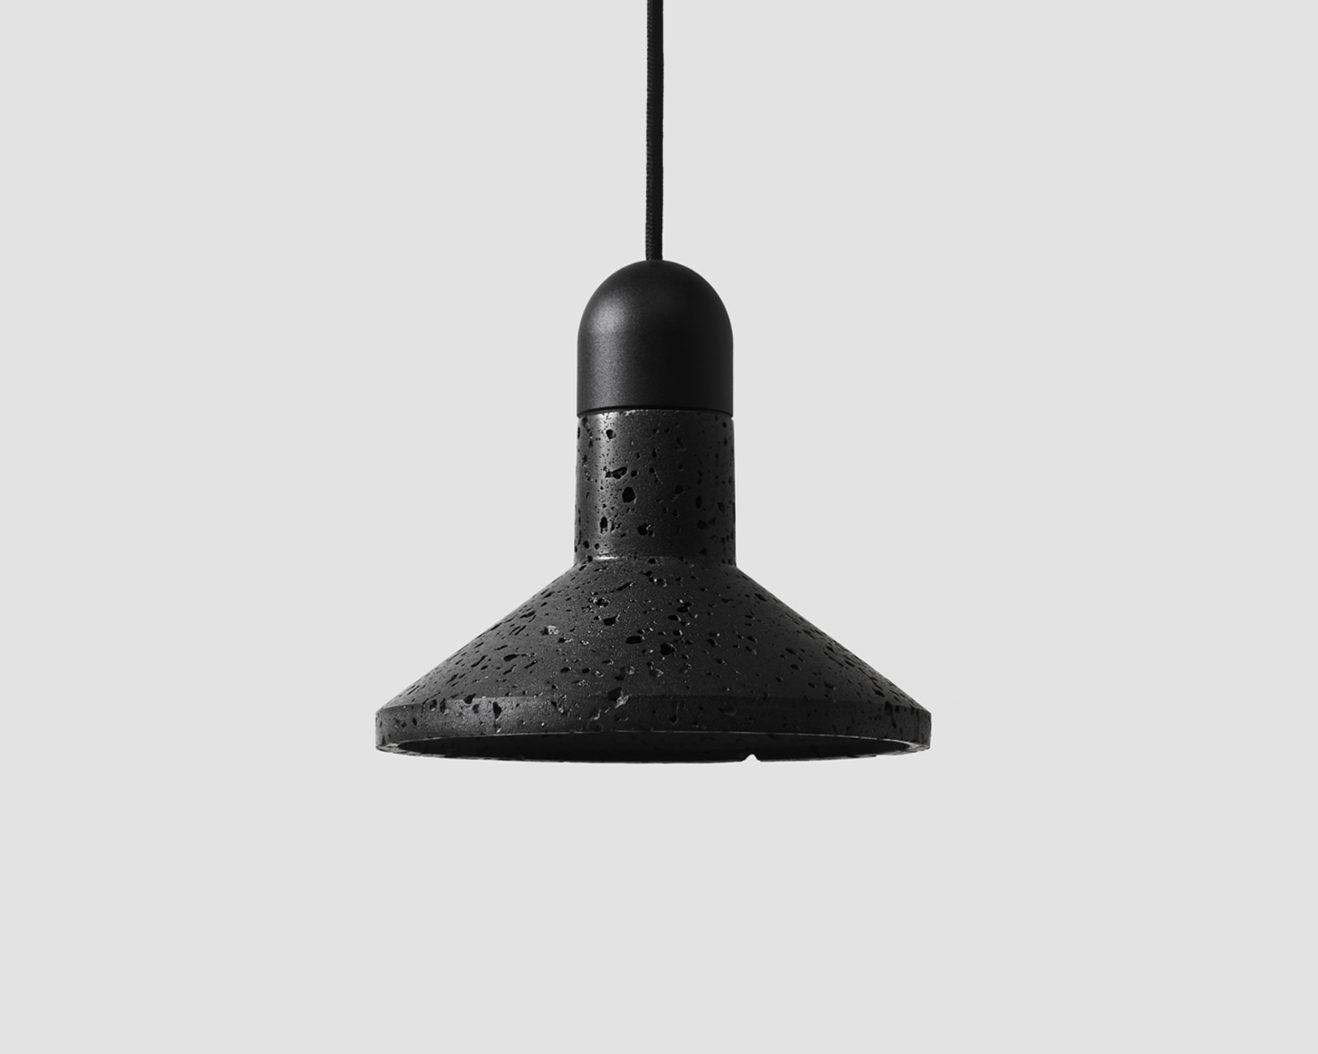 Buzao-Shang-Lava-Stone-Pendant-Lamp-Savannah-Bay-Gallery